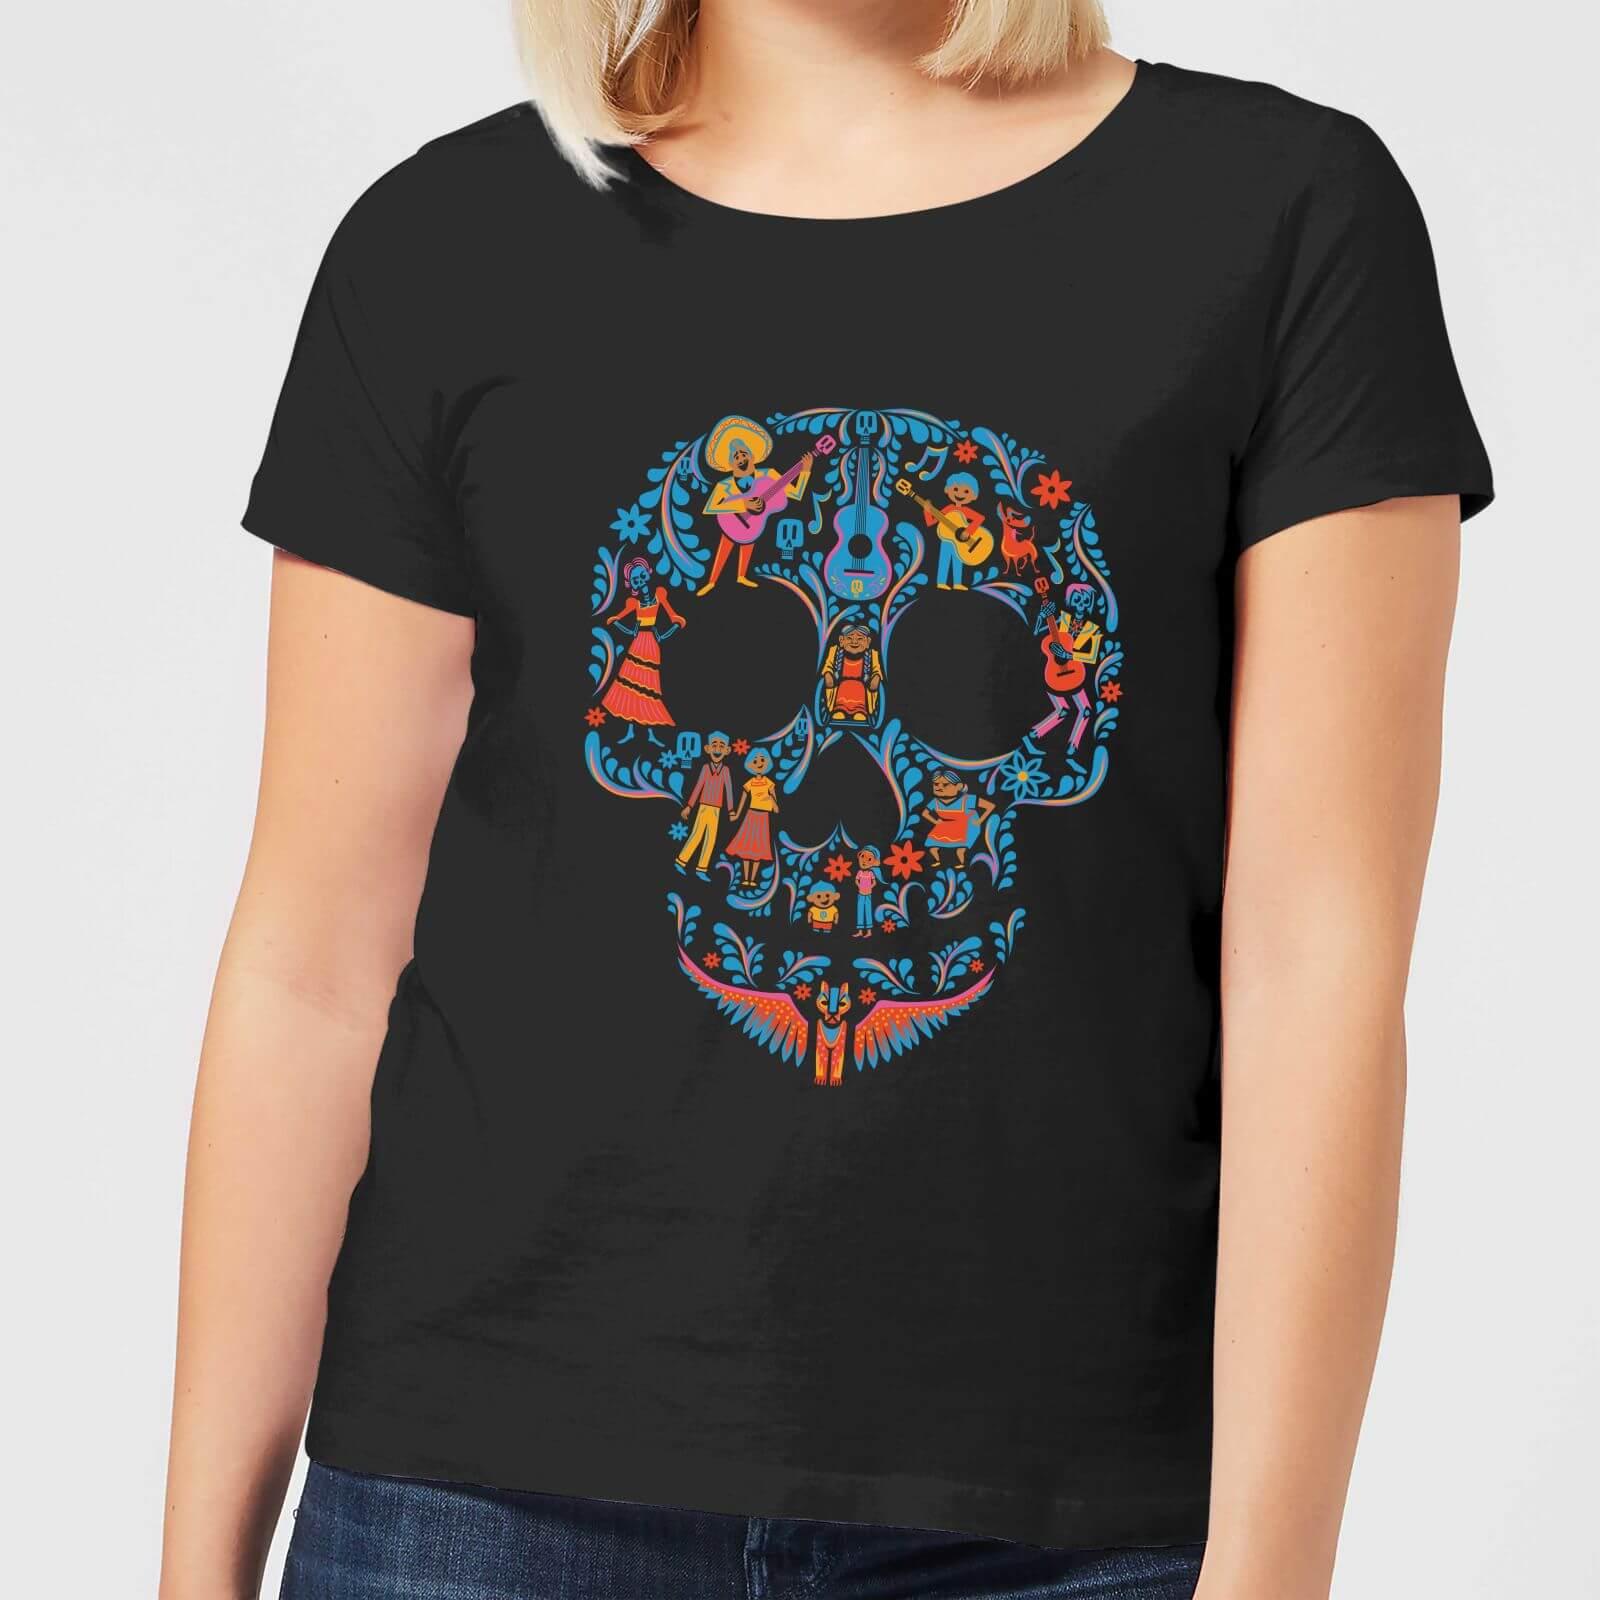 Disney Coco Skull Pattern Women's T-Shirt - Black - S - Black